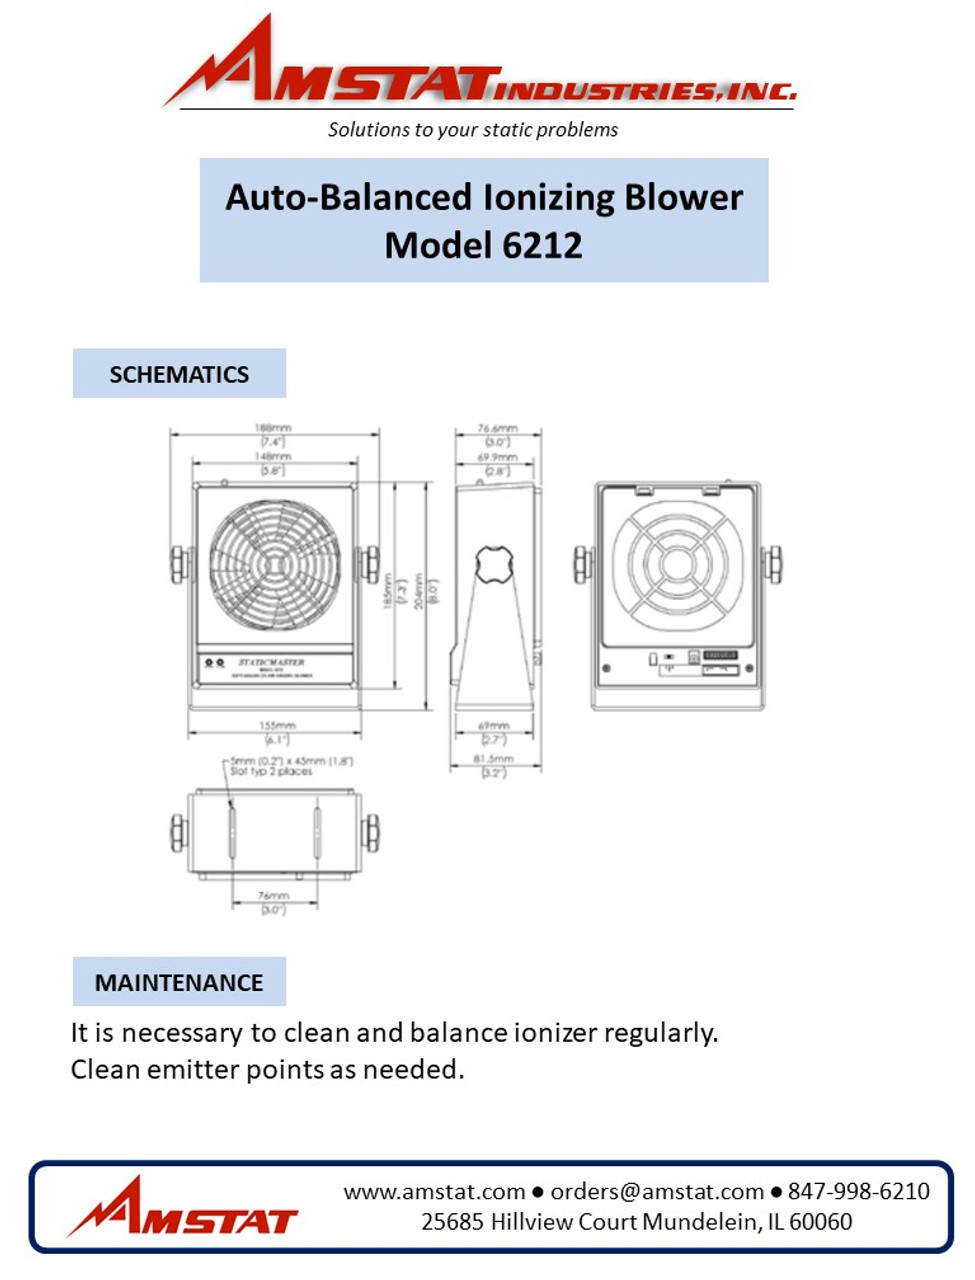 Auto-Balanced Ionizing Blower - 140 CFM